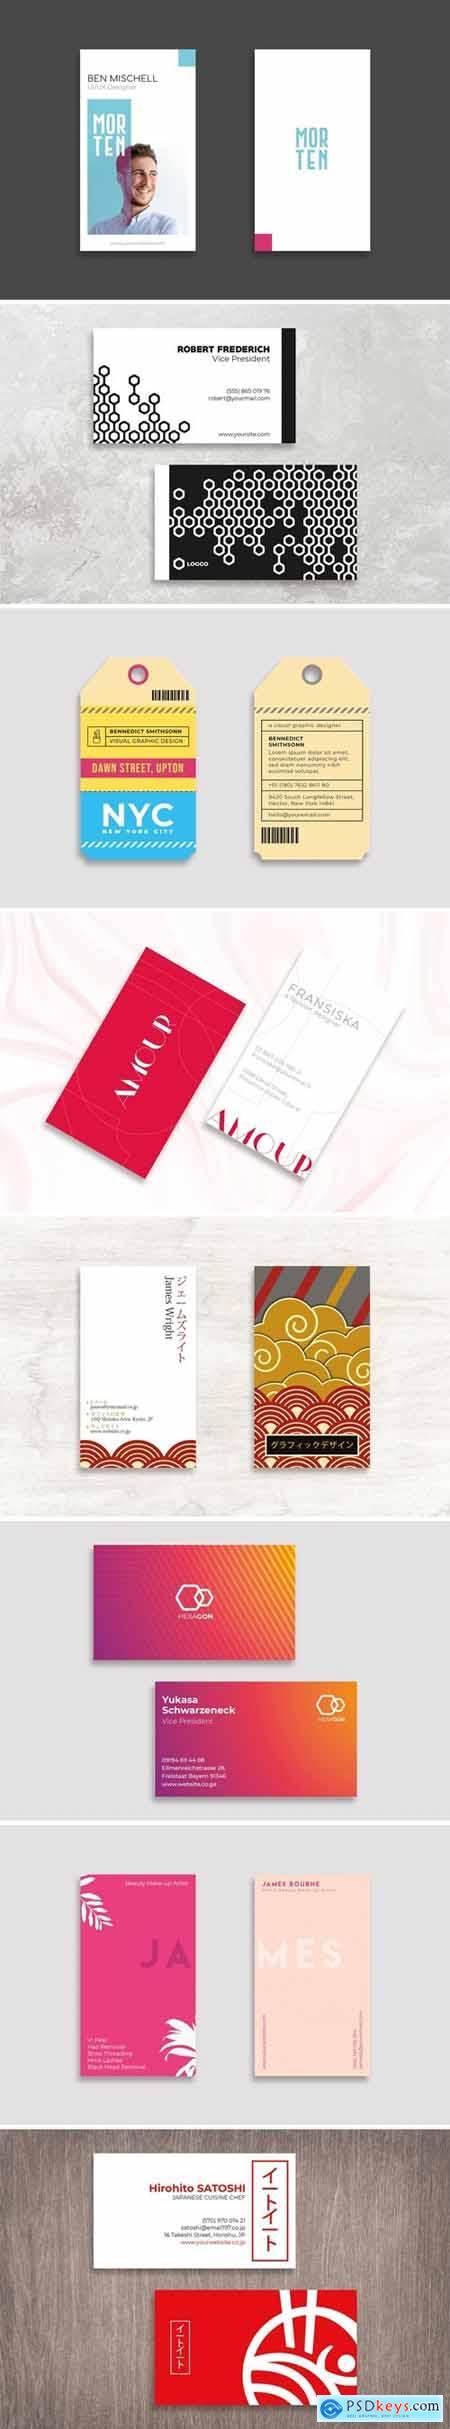 Business Card Design Professional Bundle 2